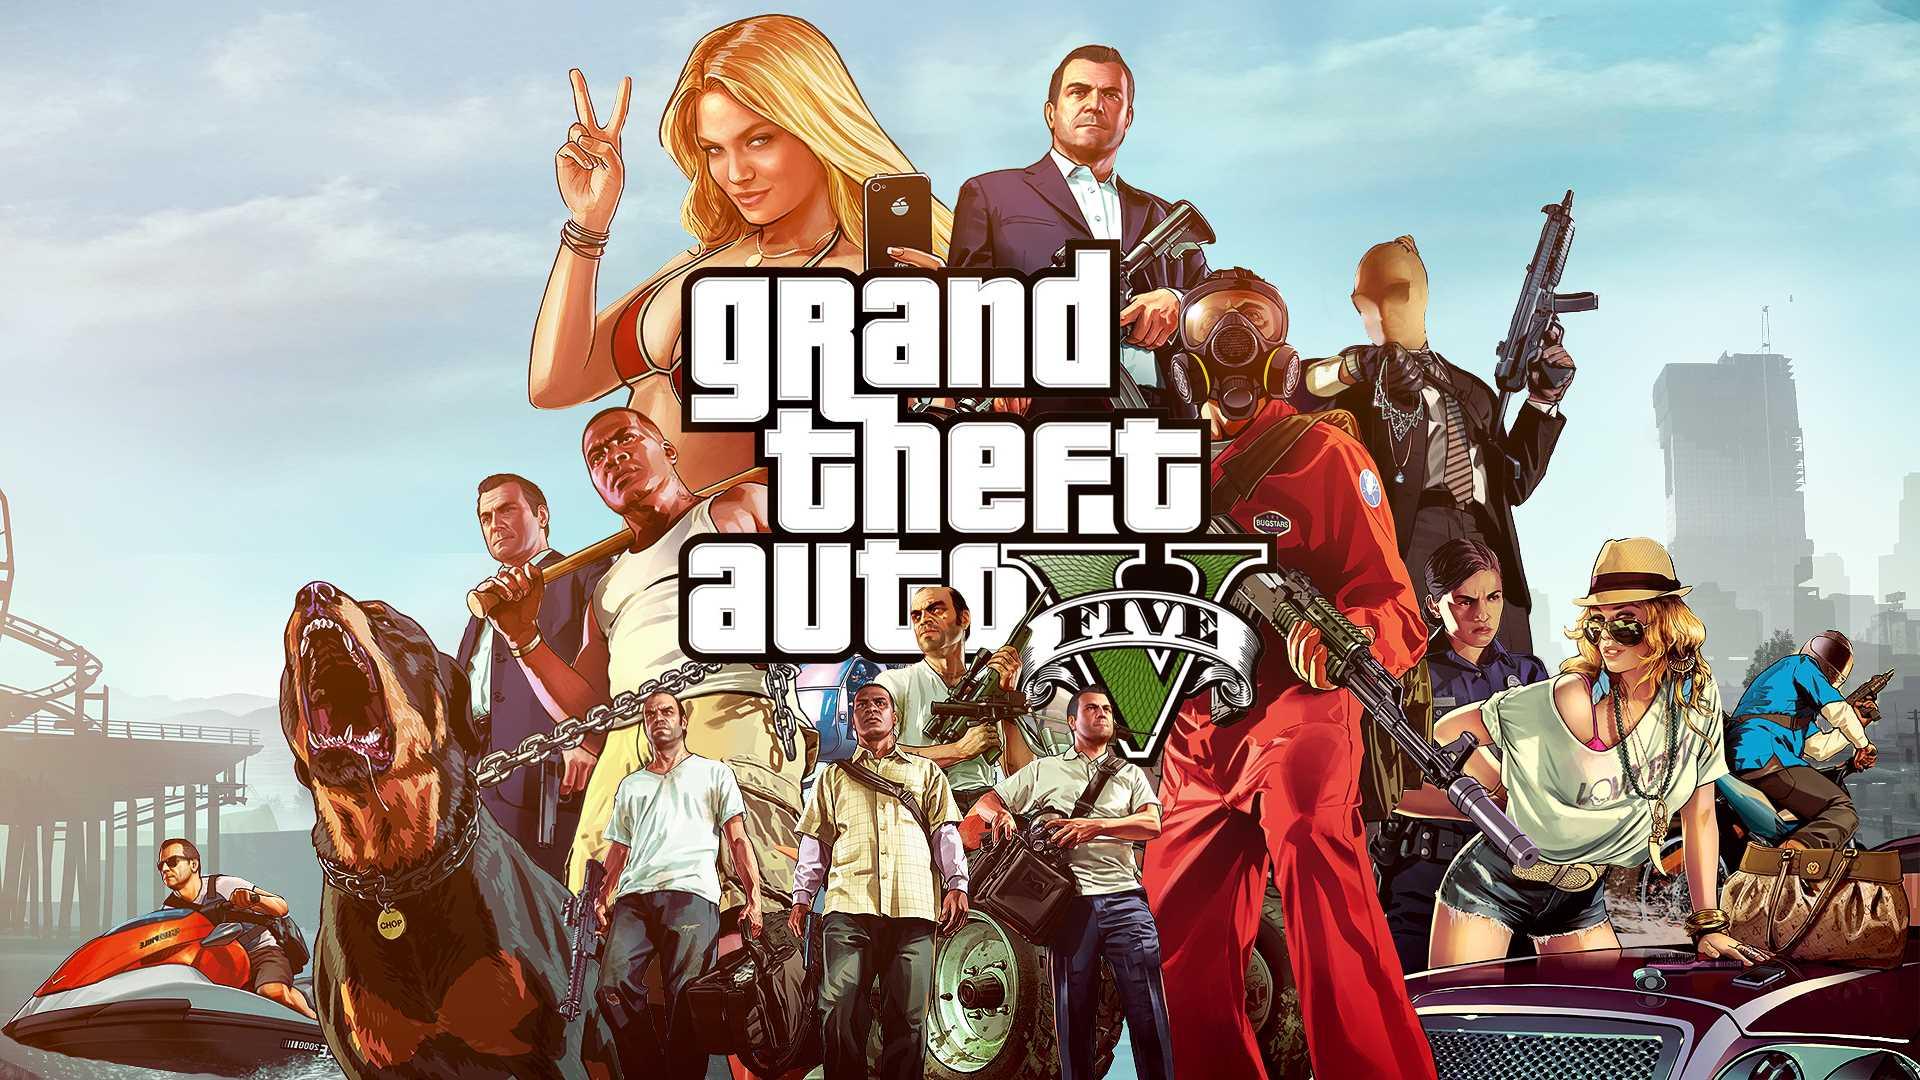 GTA 5 wallpaper